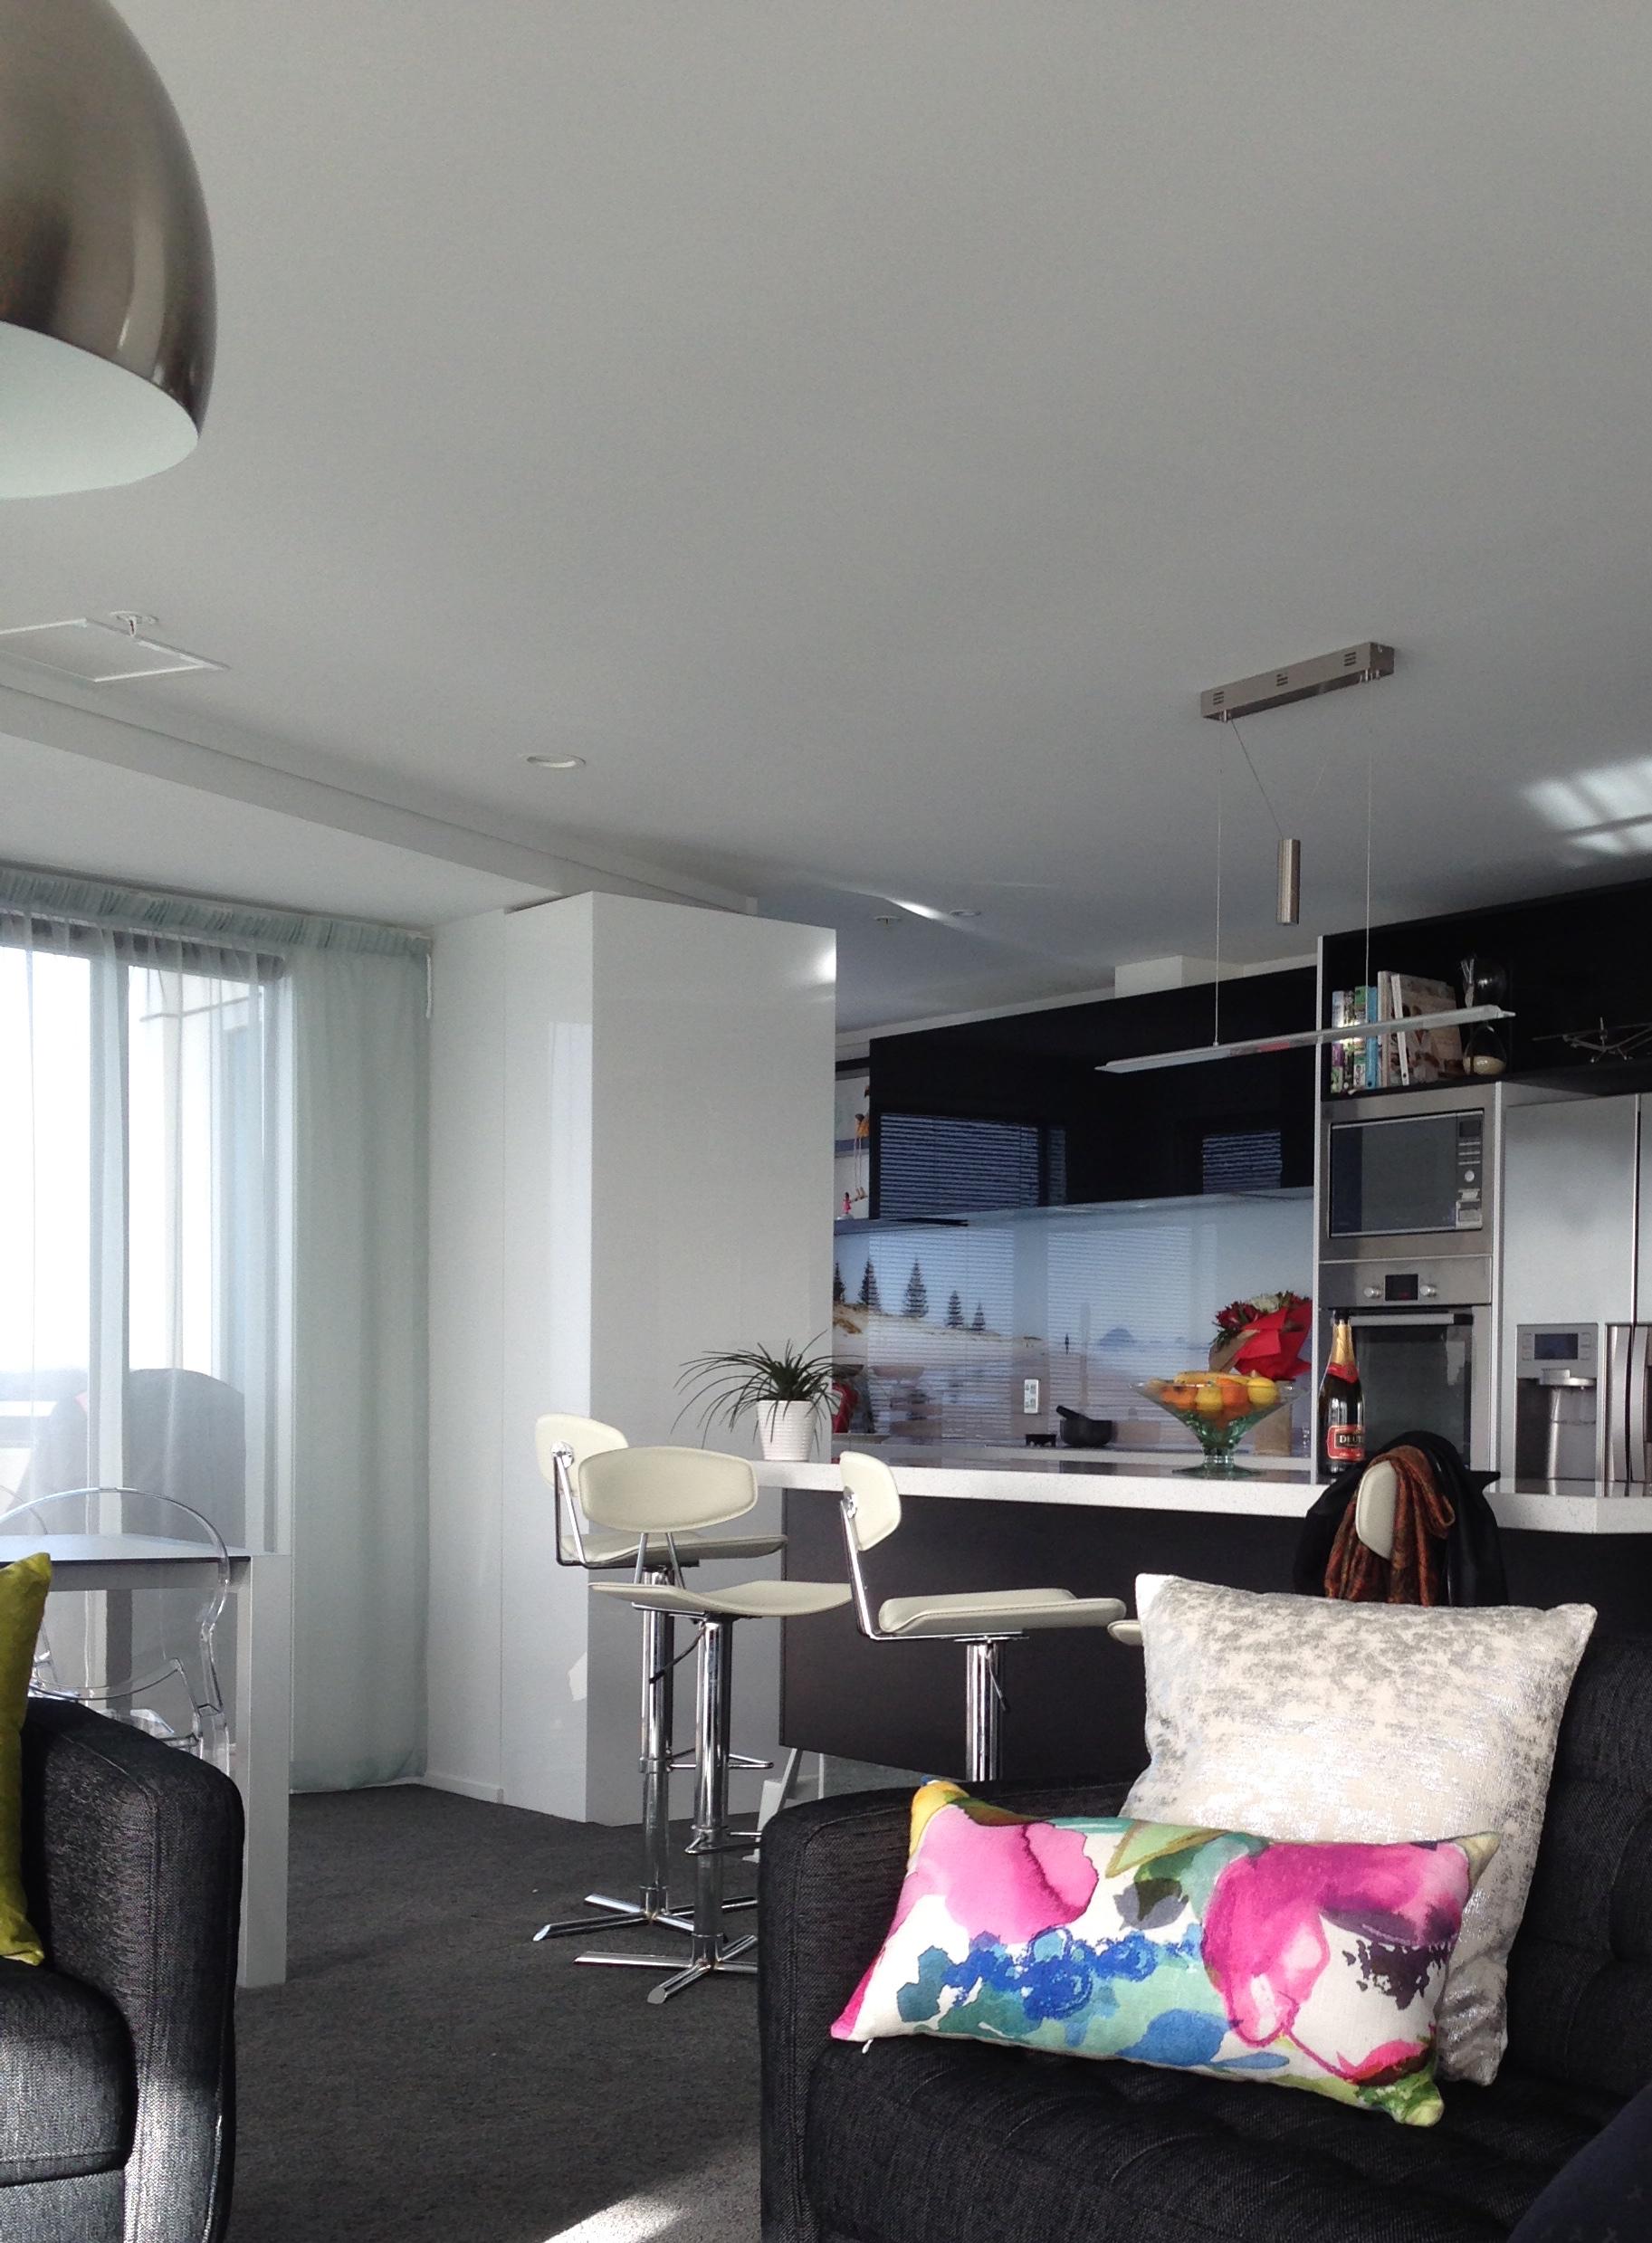 Tauranga apartment refurbishment